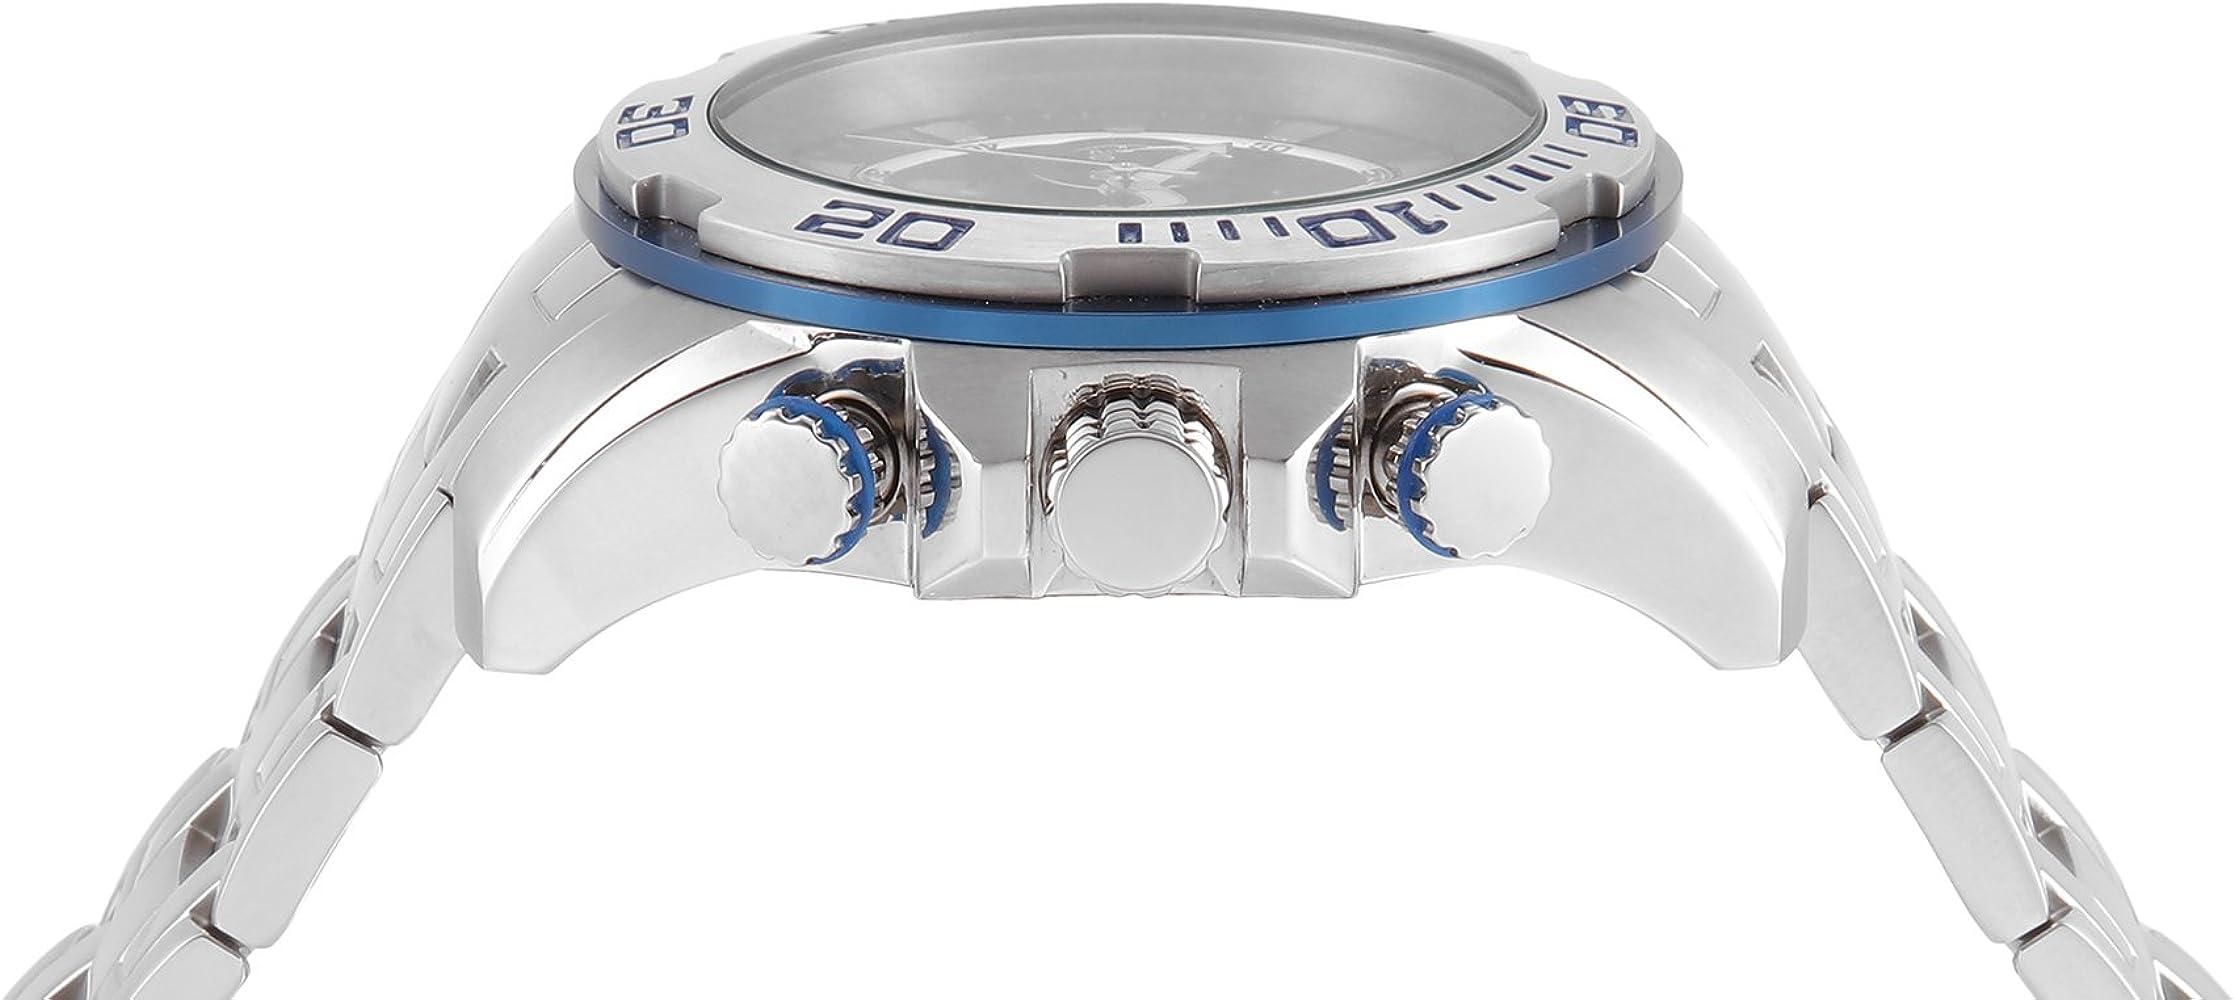 Invicta Men Pro Diver Quartz Watch with StainlessSteel Strap Silver 26 Model 22319